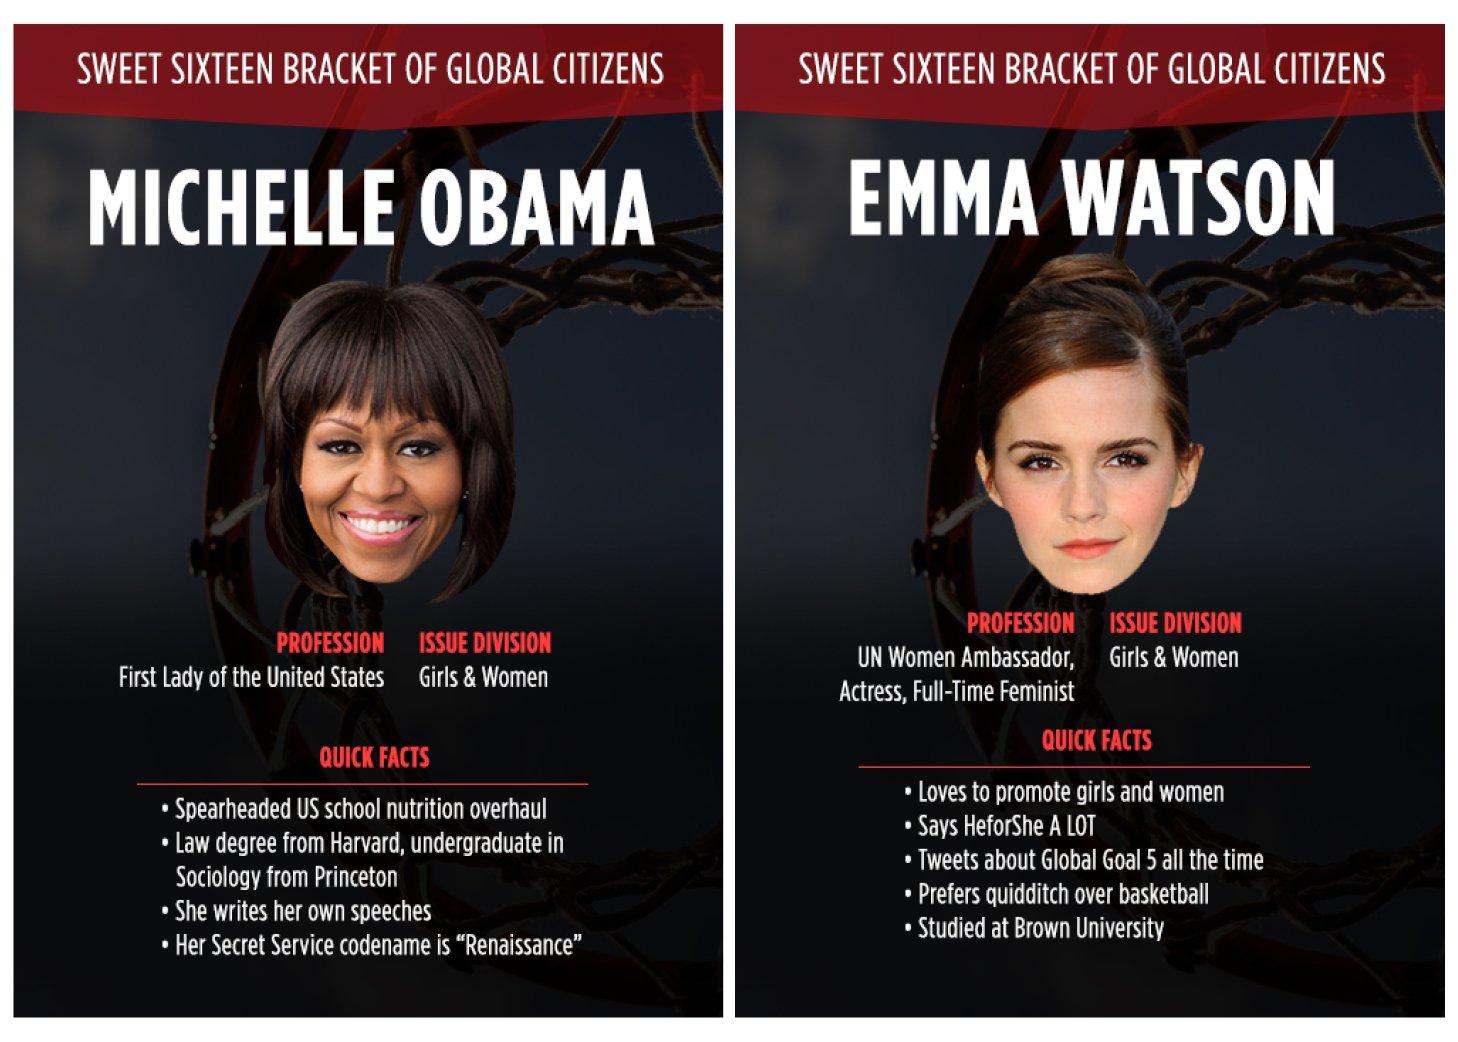 Obama-vs-Watson.jpg